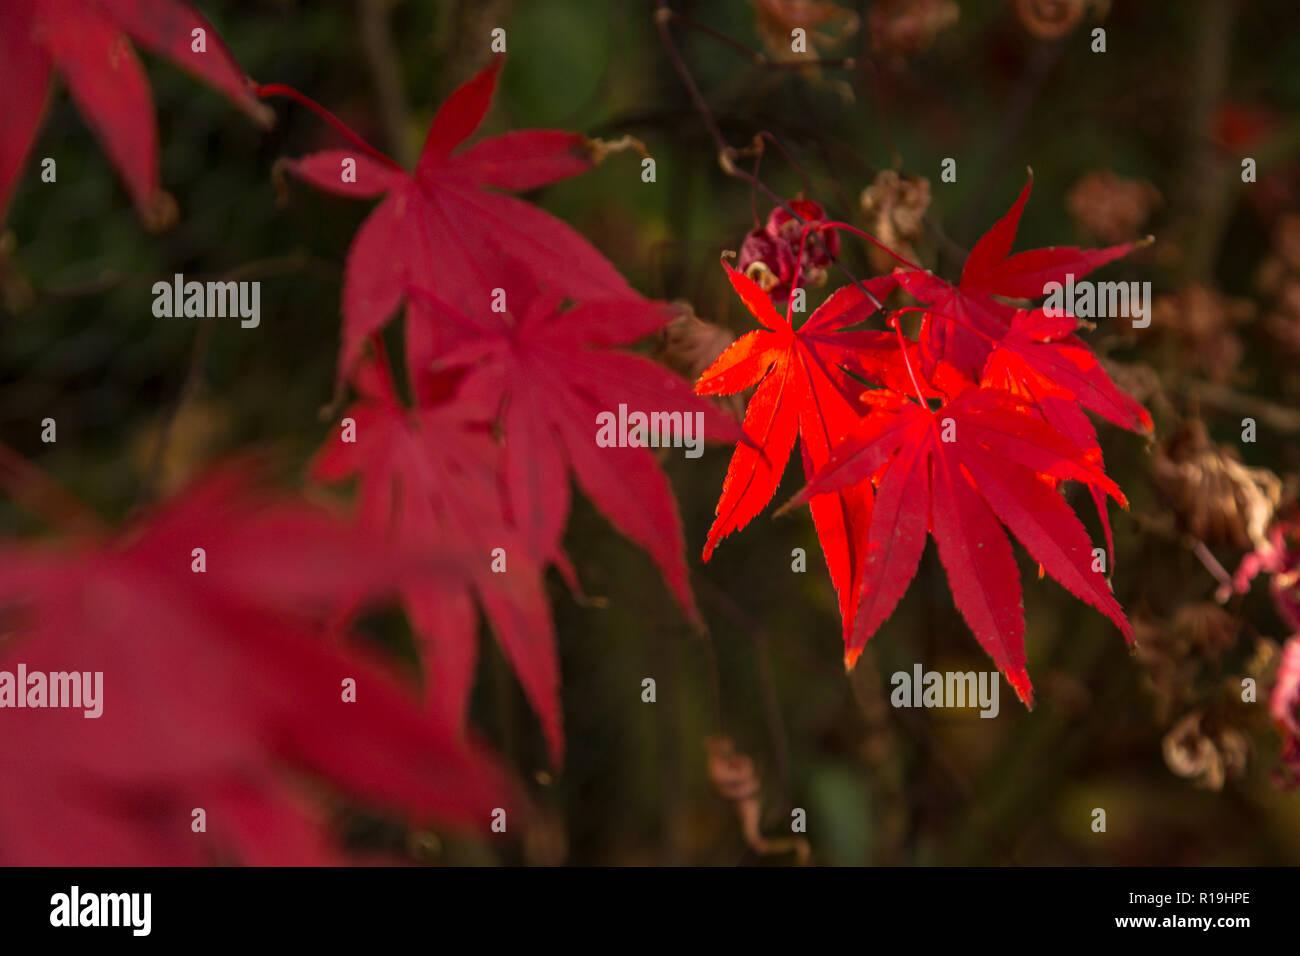 Acer Palmatum Bloodgood, a Japanese maple, in autumn in a Devon garden. Stock Photo